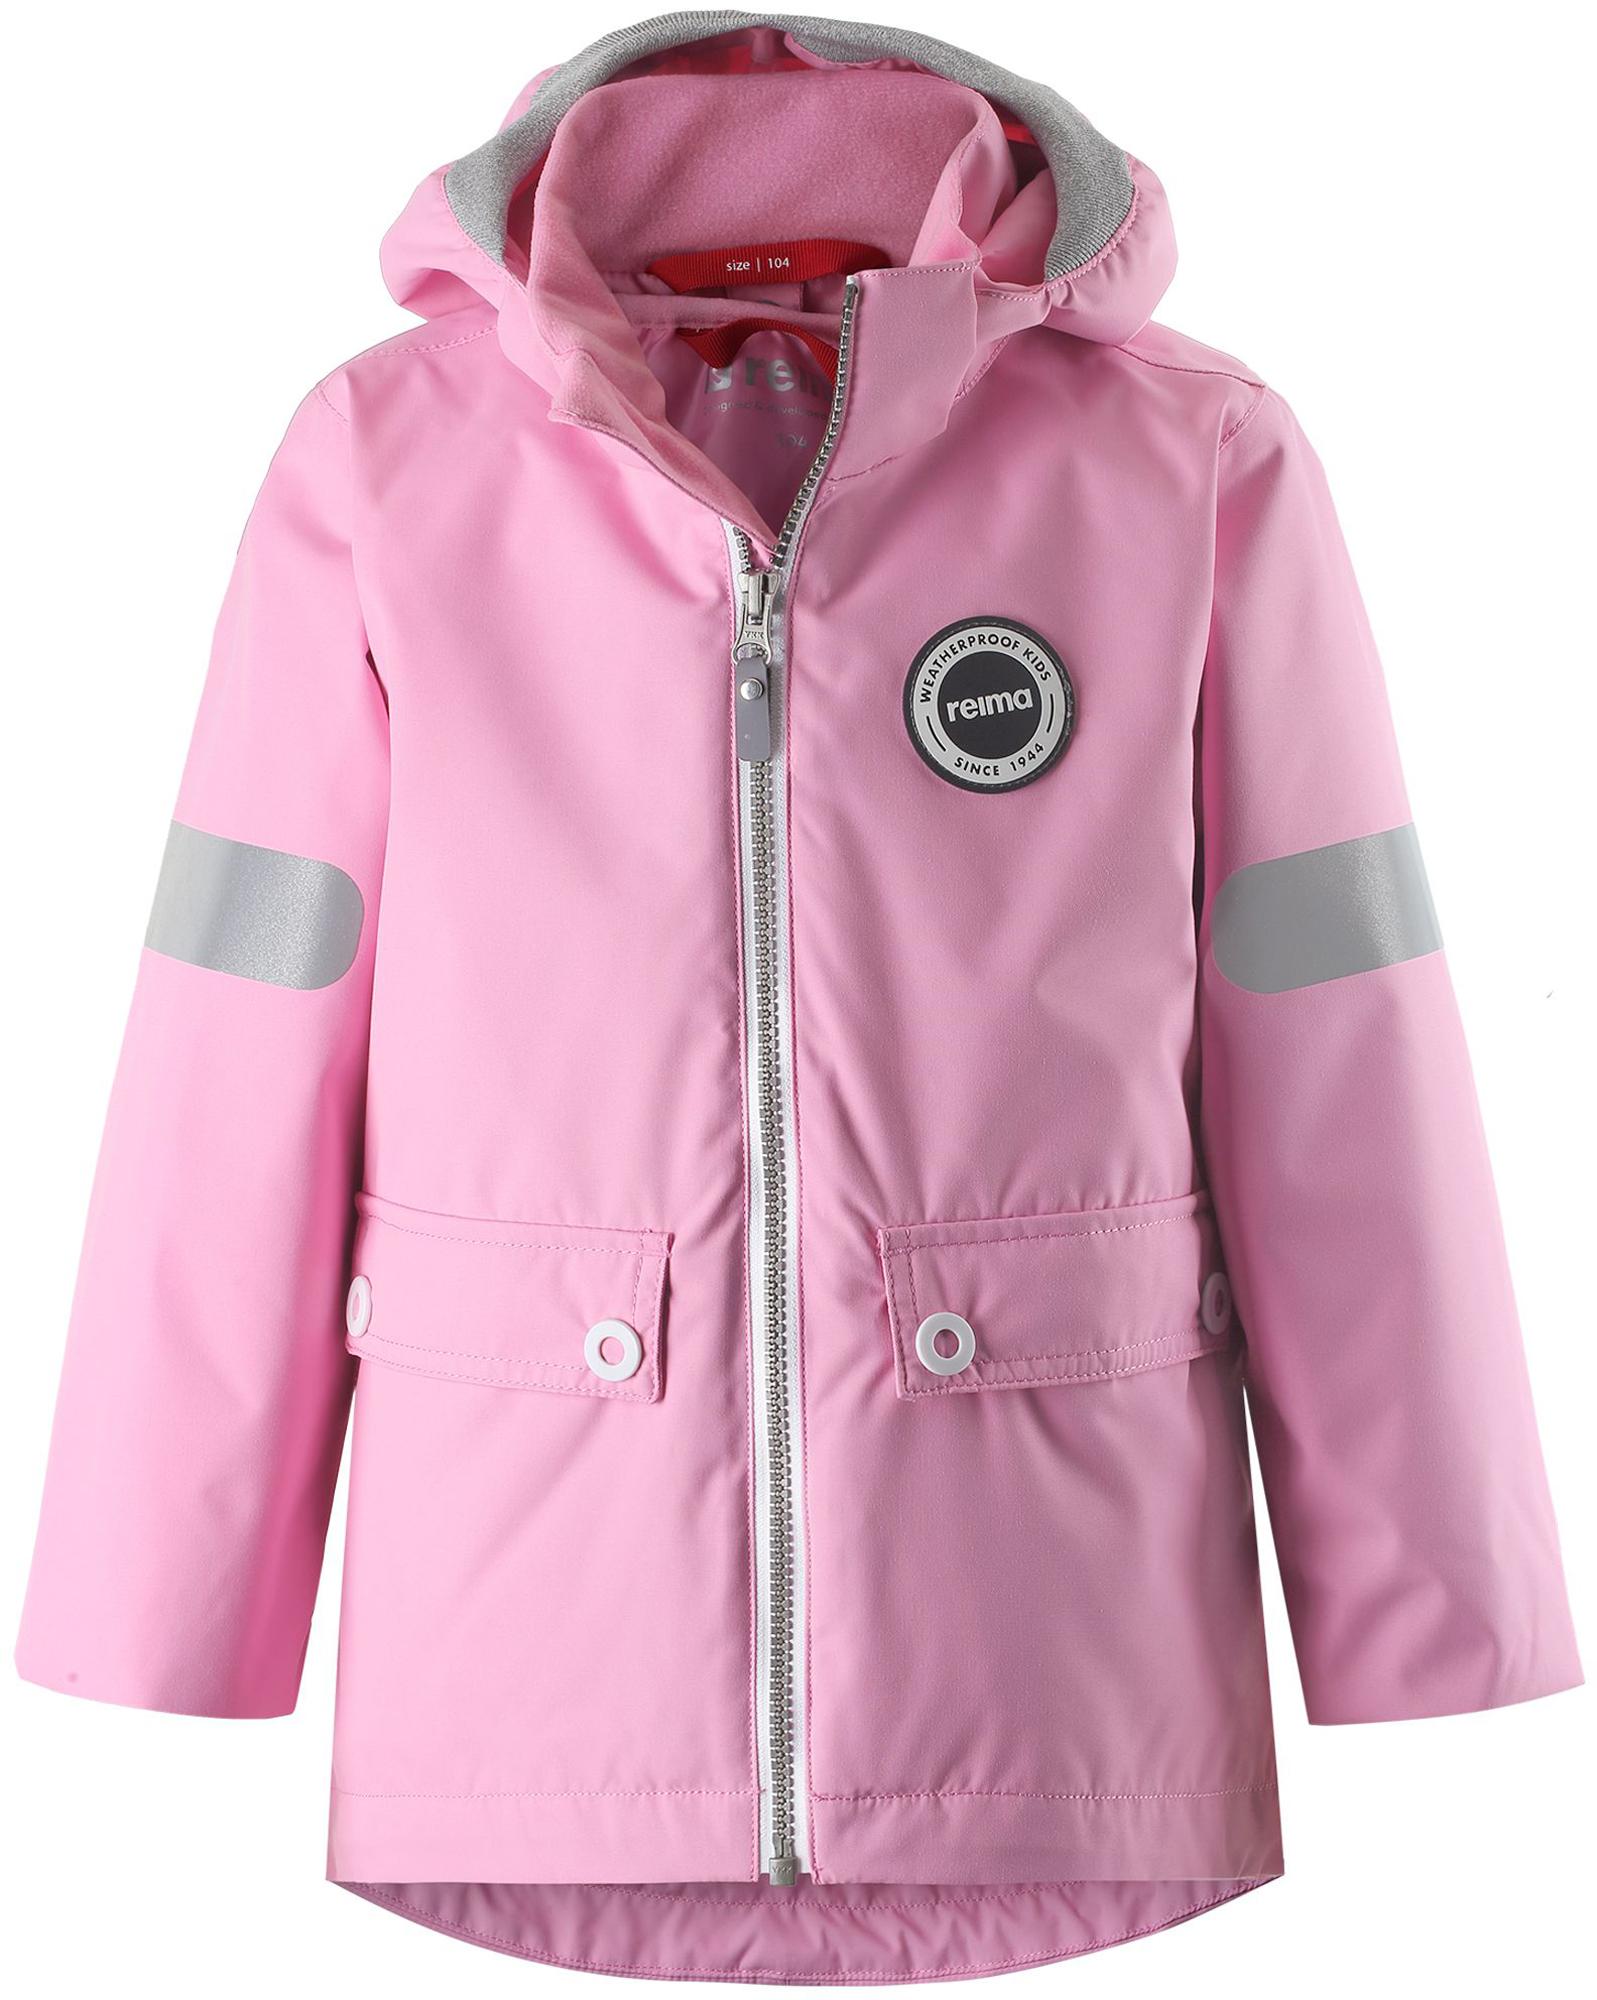 Reima Куртка утепленная для девочек Reima Sydvest, размер 122 reima толстовка для девочек reima haiko размер 146